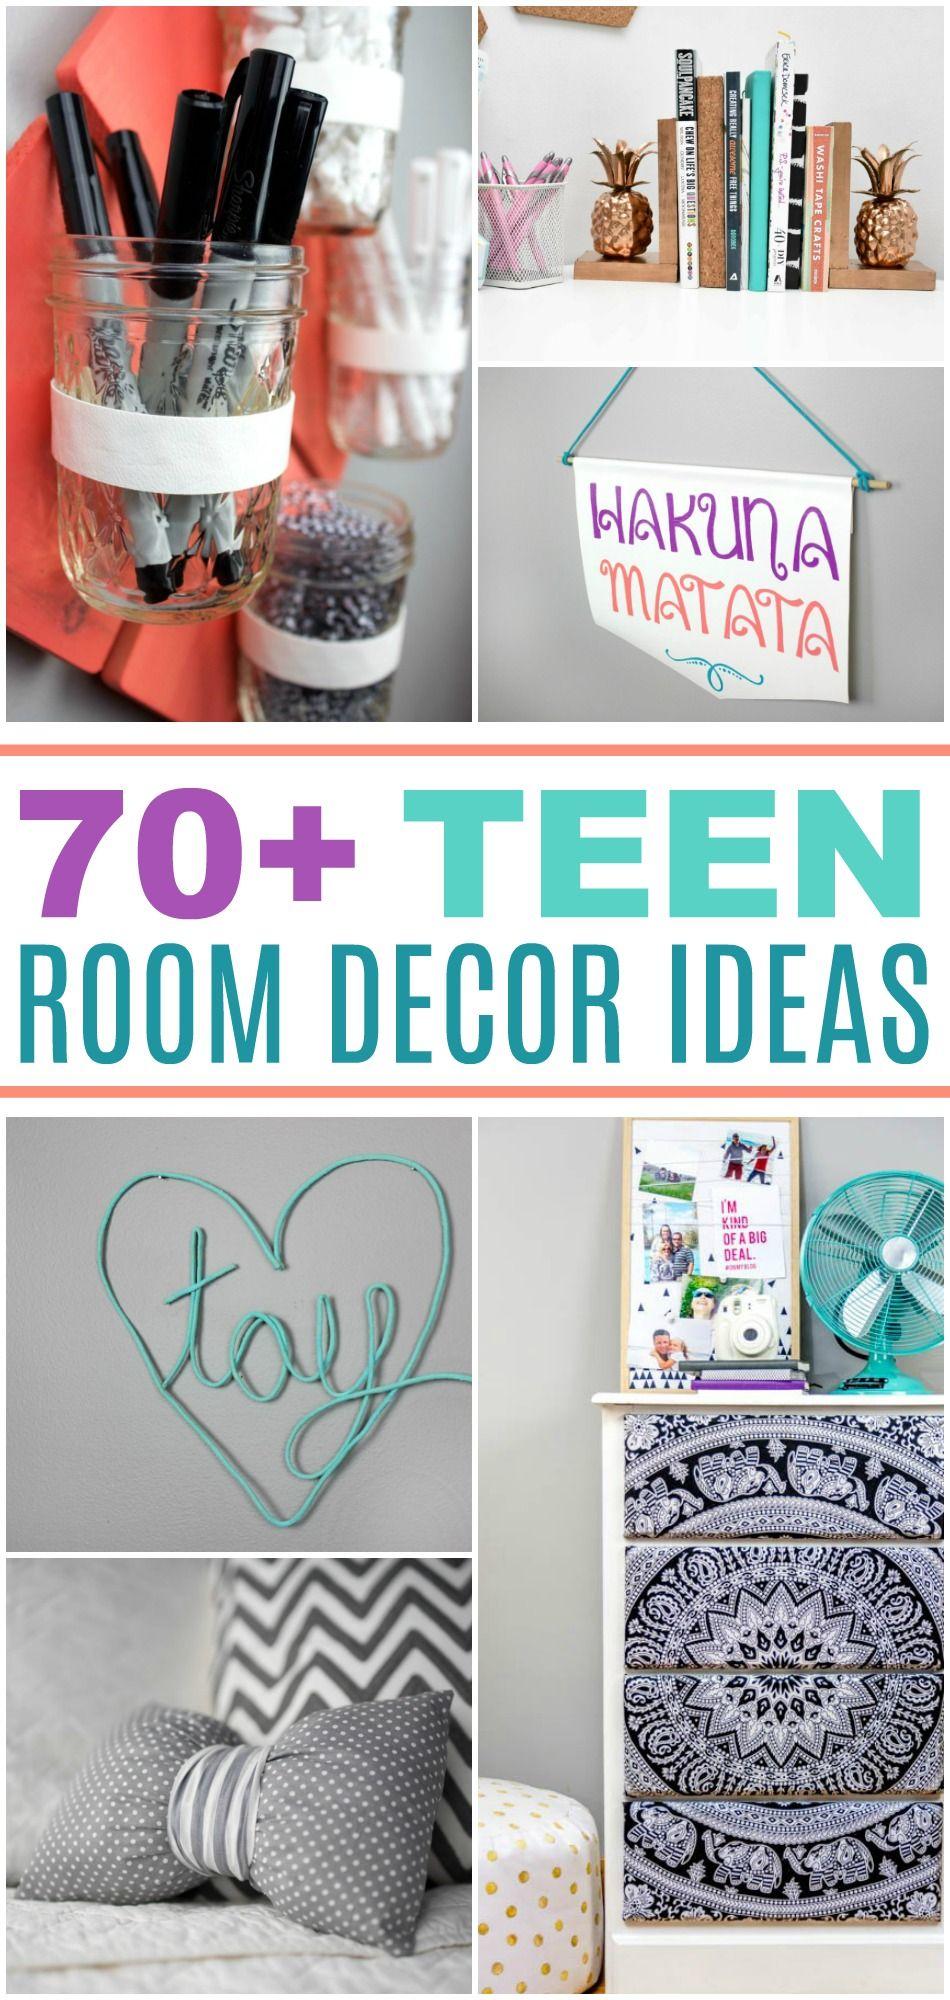 Cute Easy Diy Room Decor